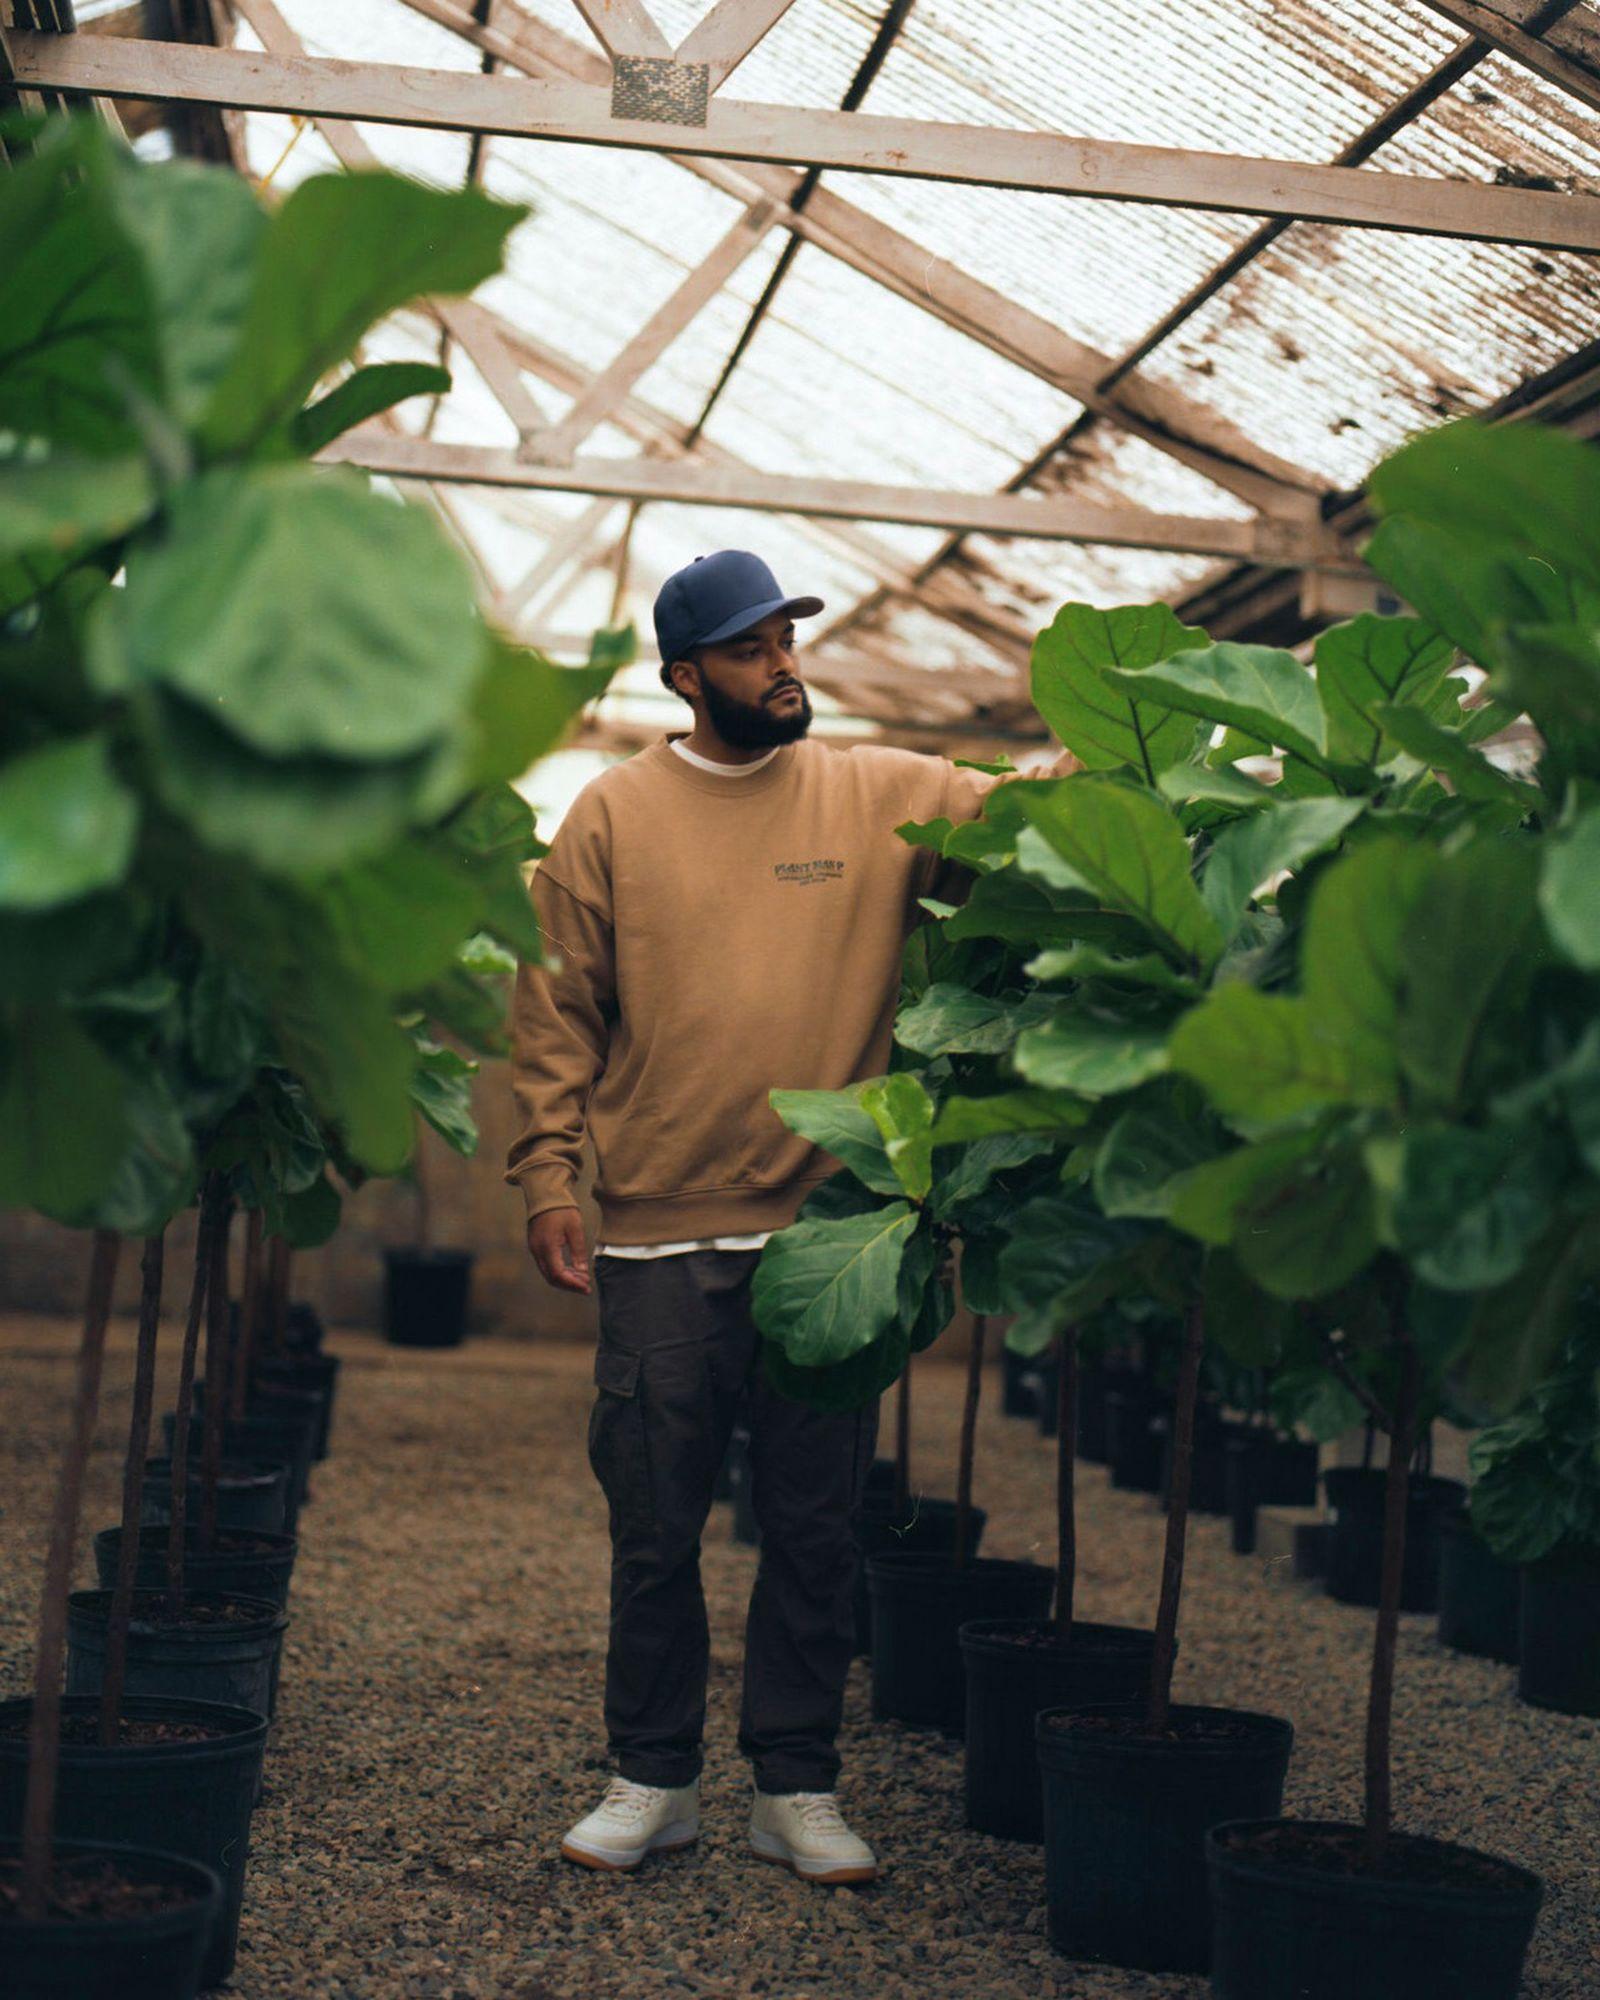 plant-man-p-hm-blank-staples-new-15